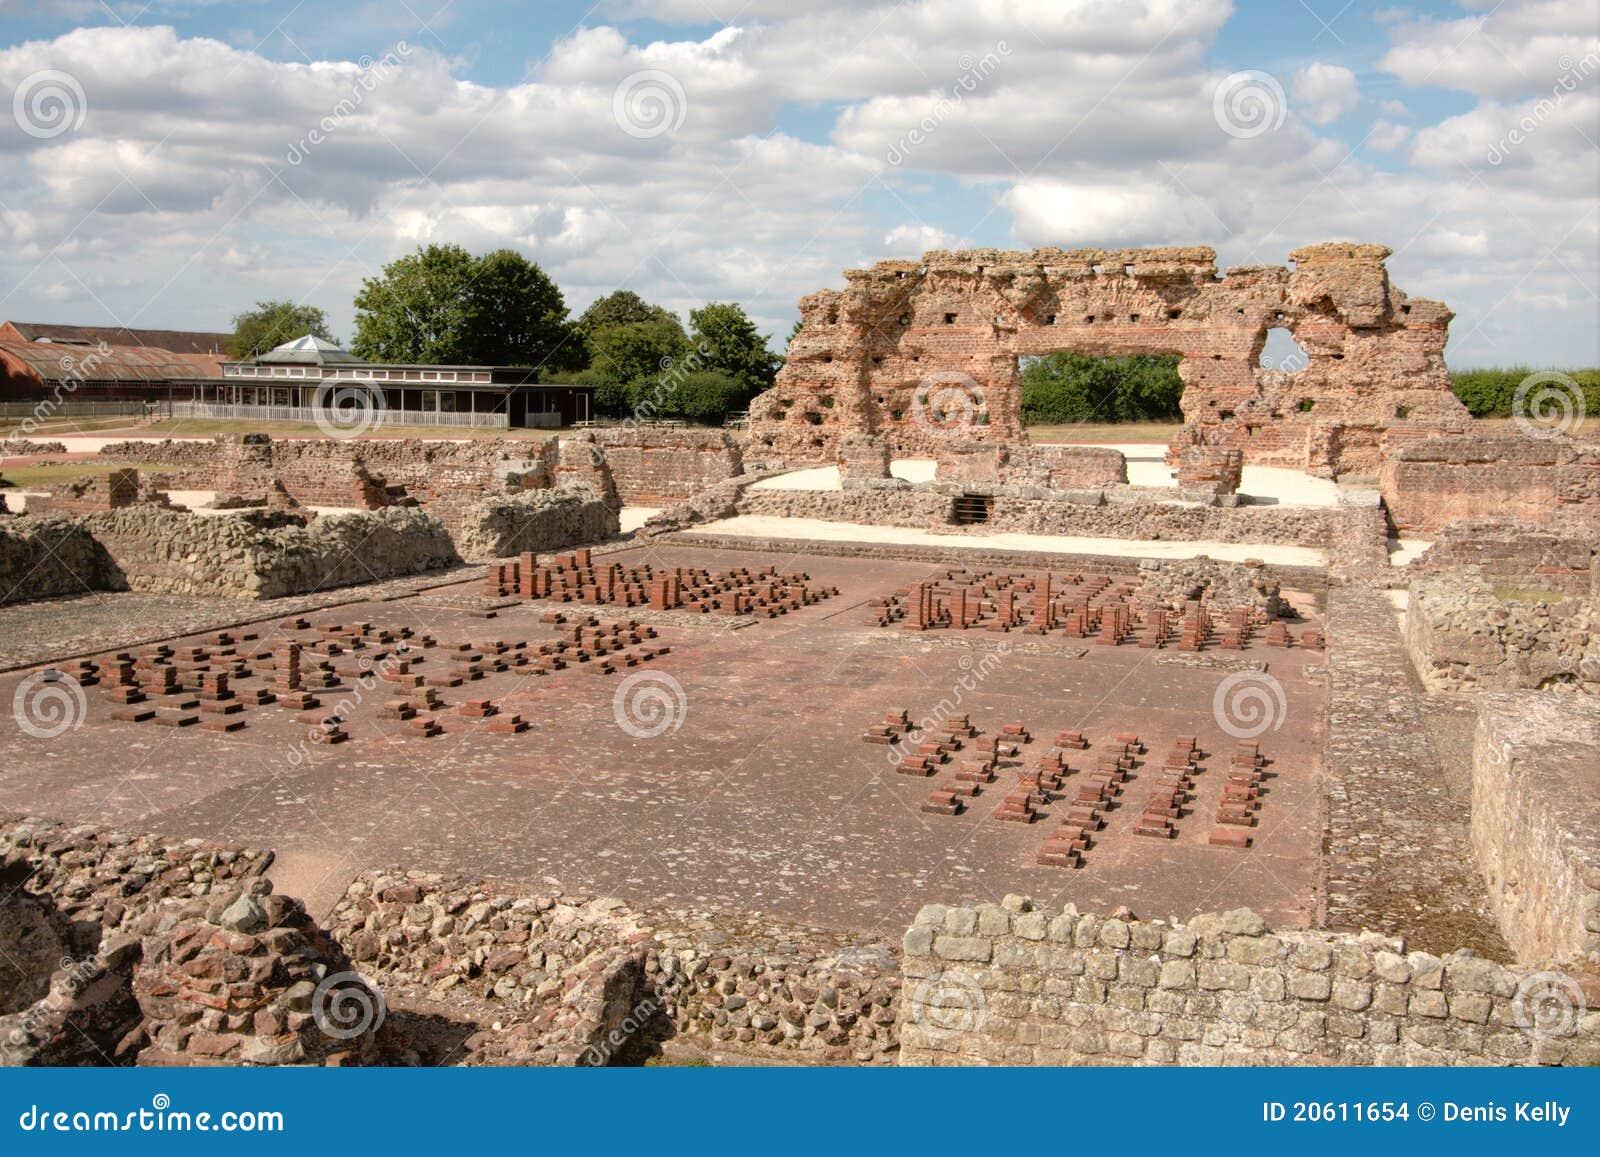 Bagni Romani Antichi, Inghilterra Immagini Stock - Immagine: 20611654